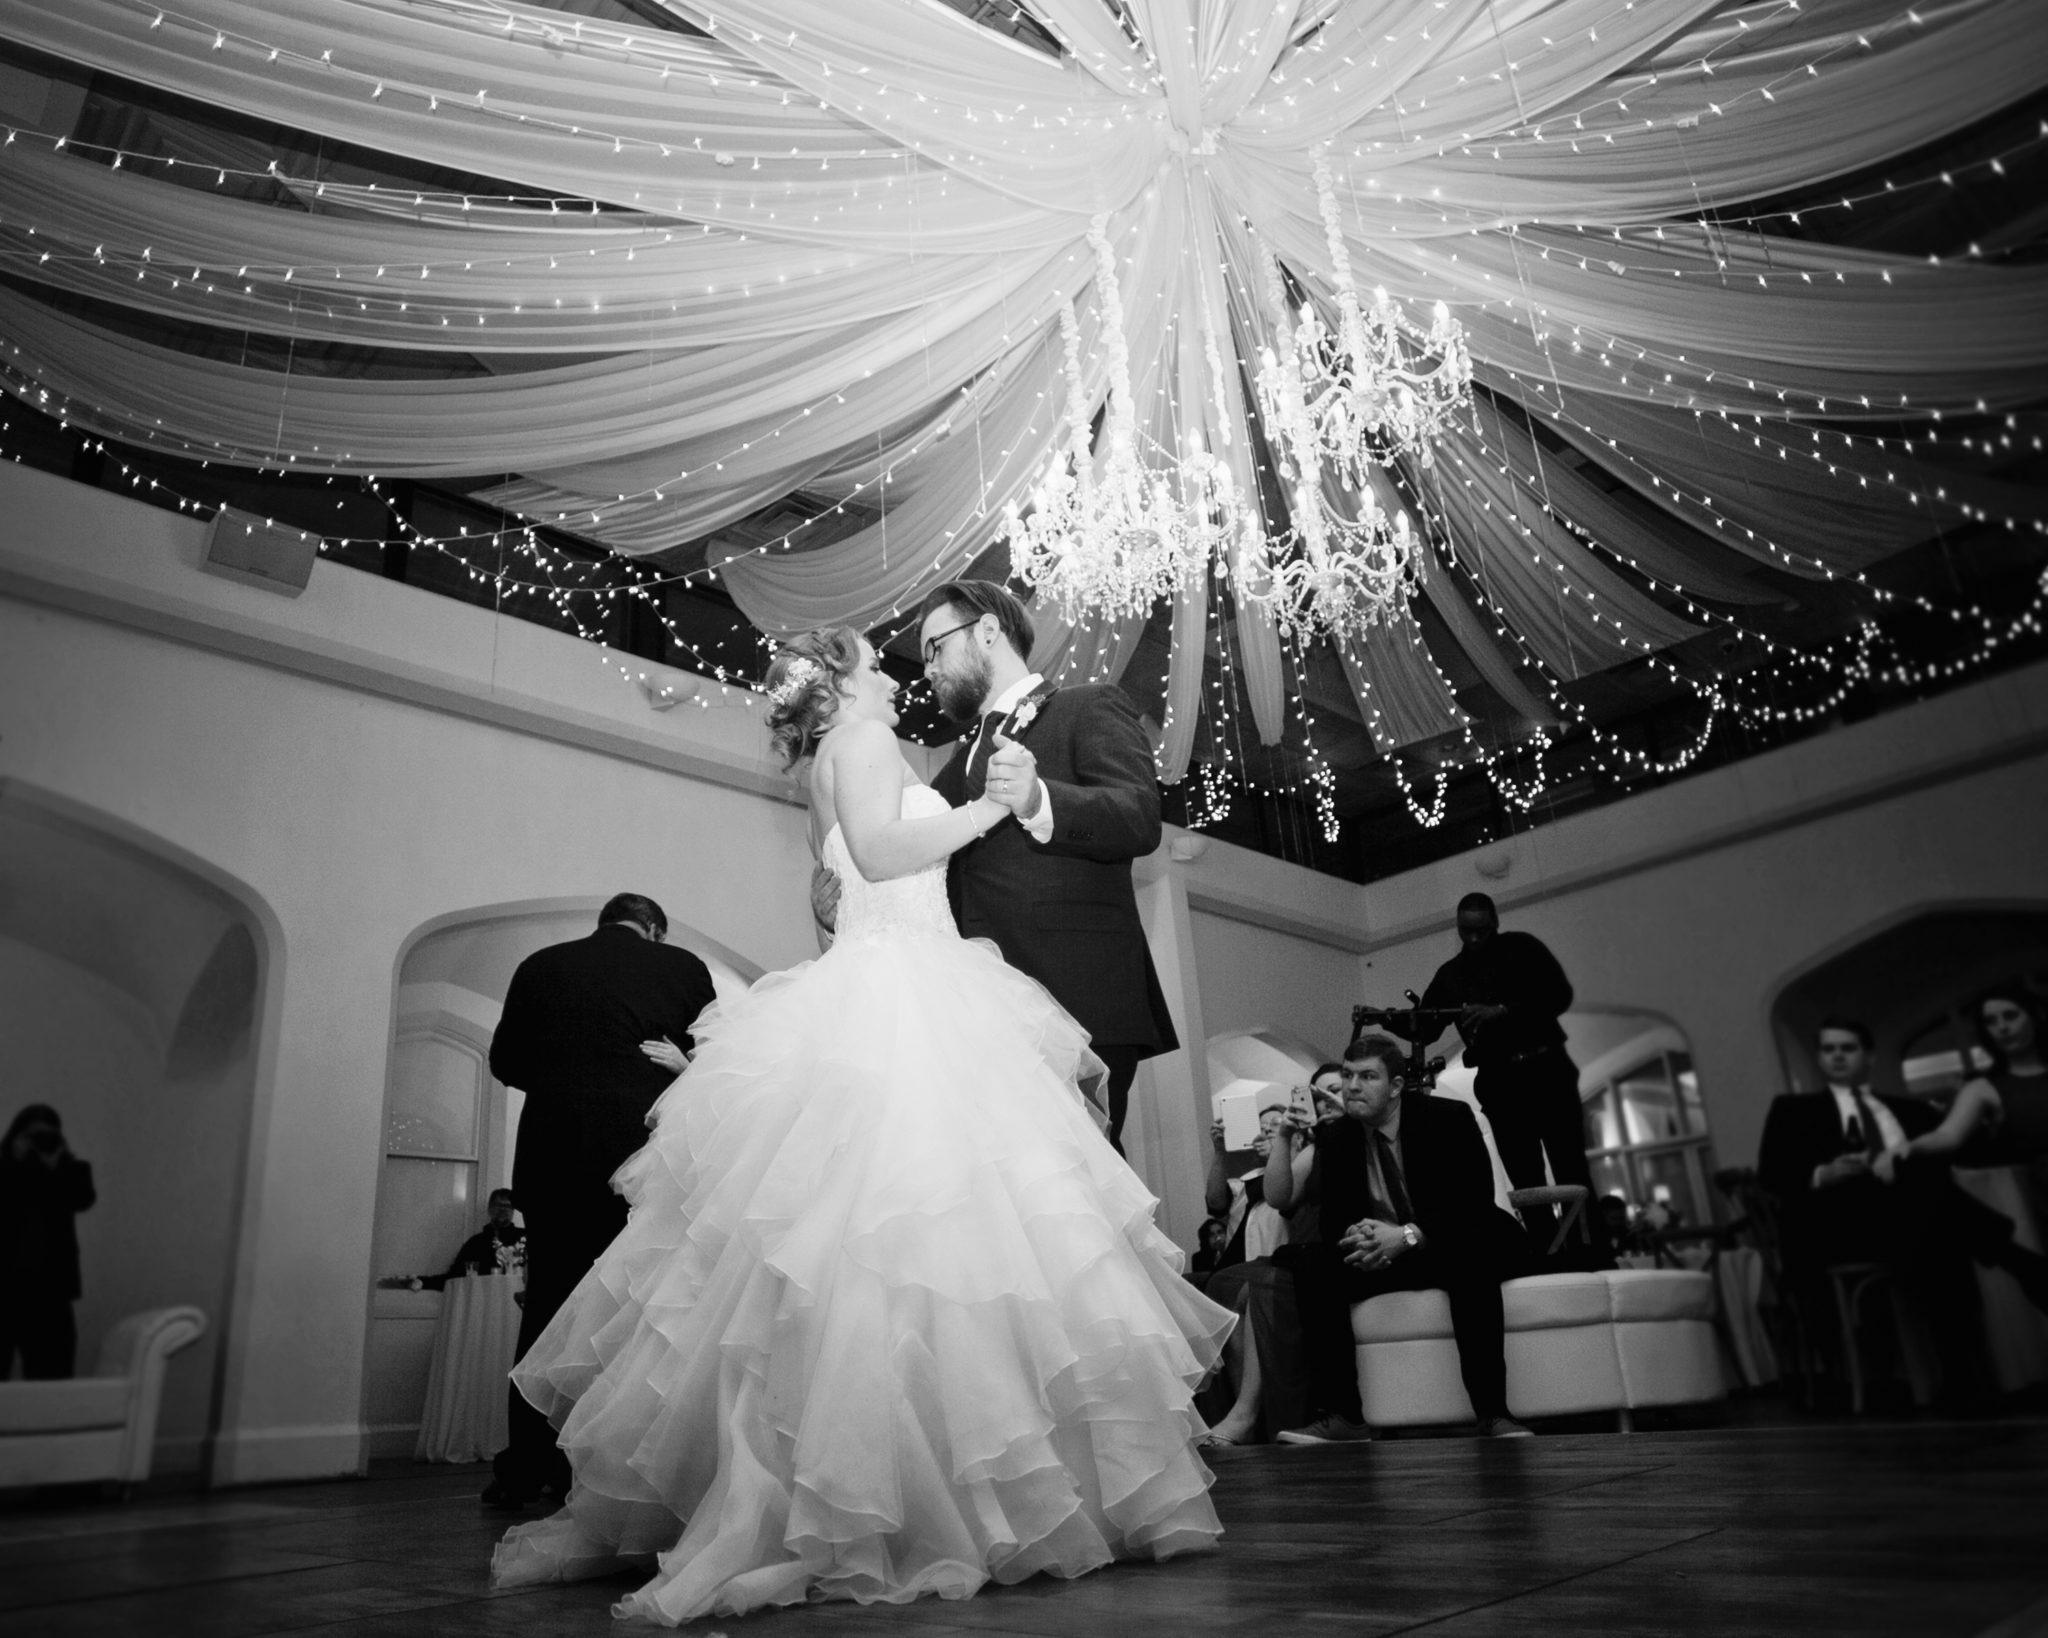 Wedding Photography by Liz Erikson